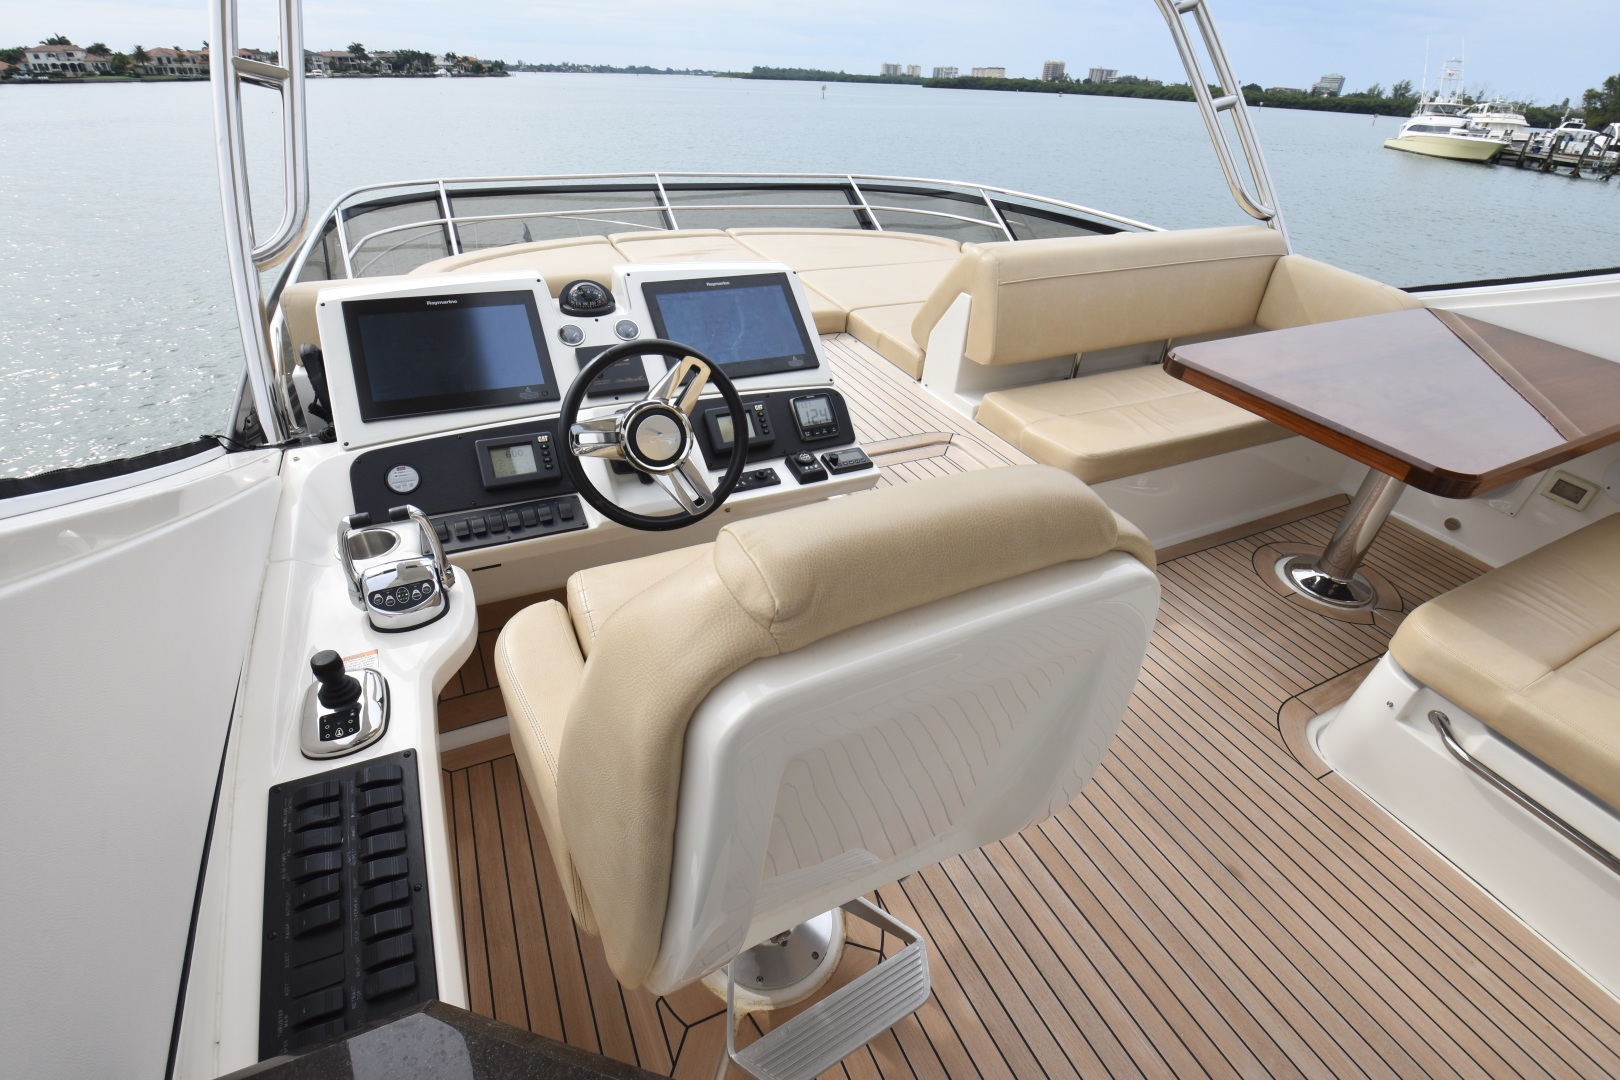 Sea Ray-L650 2016-3x's the Charm Longboat Key-Florida-United States-2016 Sea Ray L650  3x's the Charm  Flybridge Helm-1251855 | Thumbnail